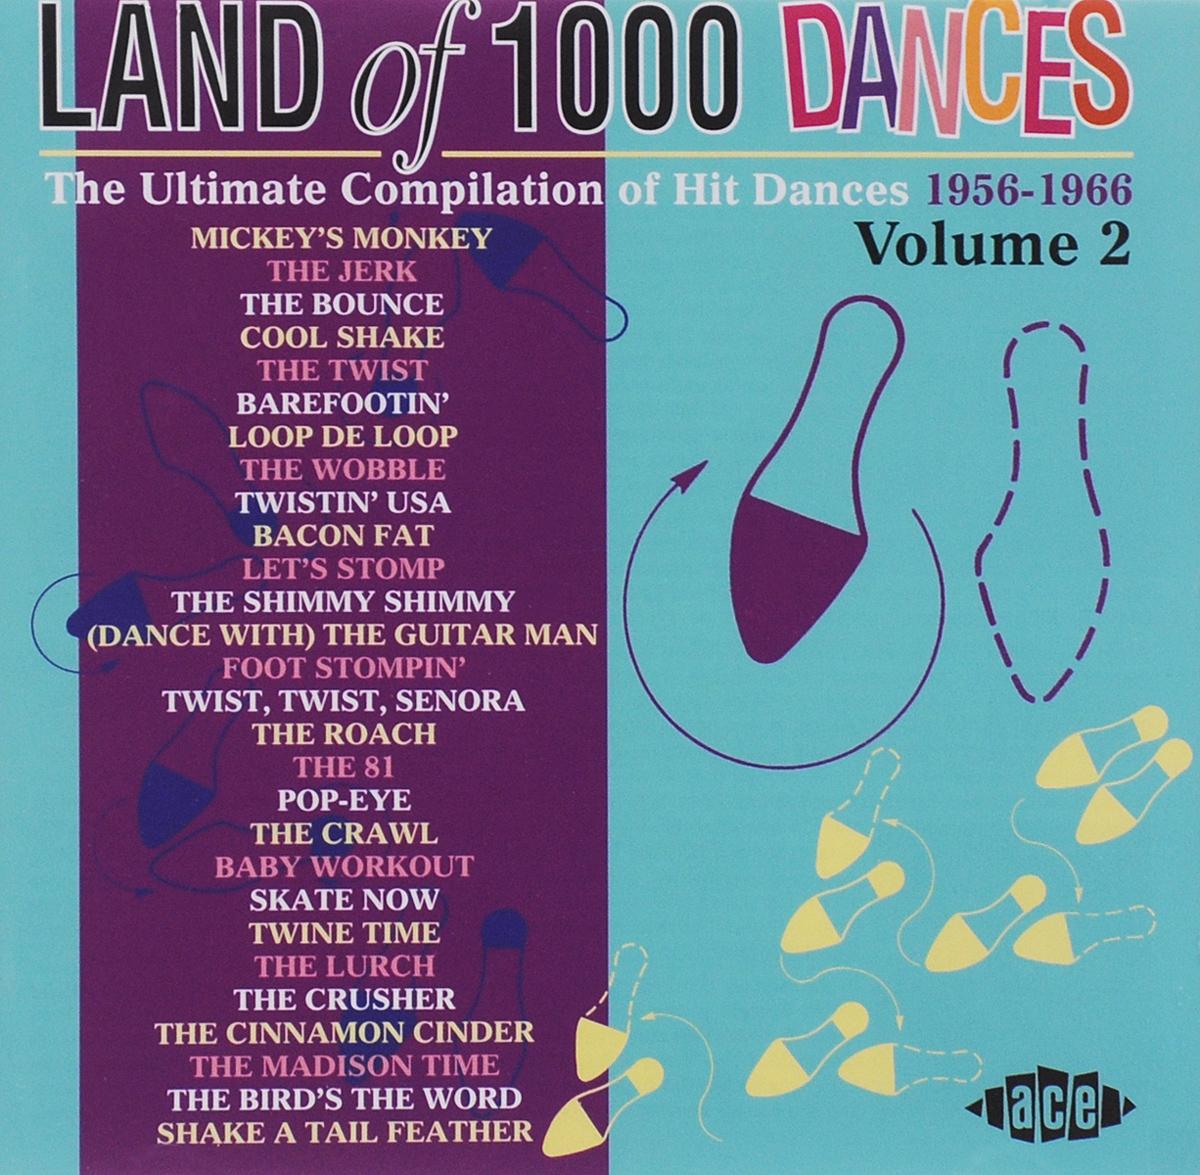 Land Of 1000 Dances. Volume 2